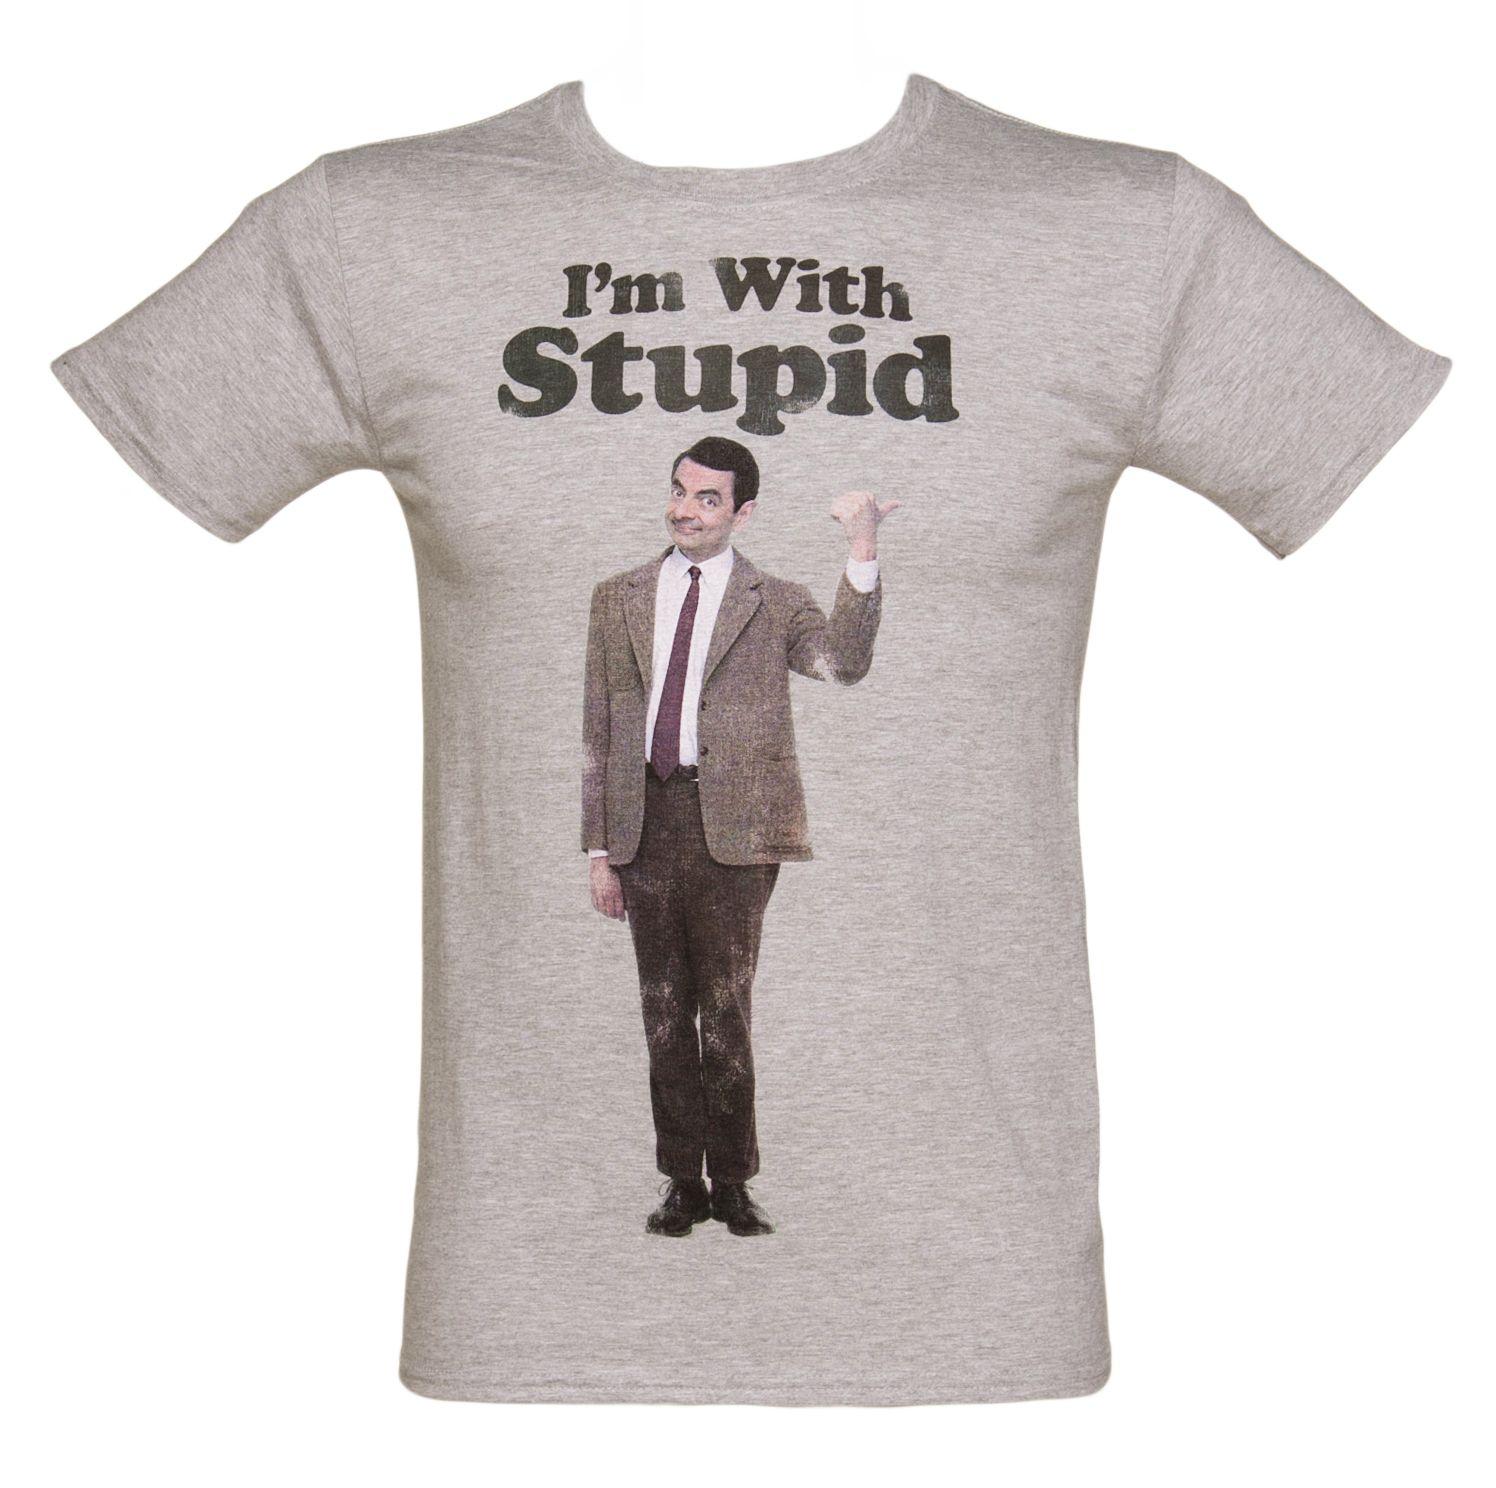 Men's #MrBean I'm With Stupid T-Shirt from TruffleShuffle xoxo